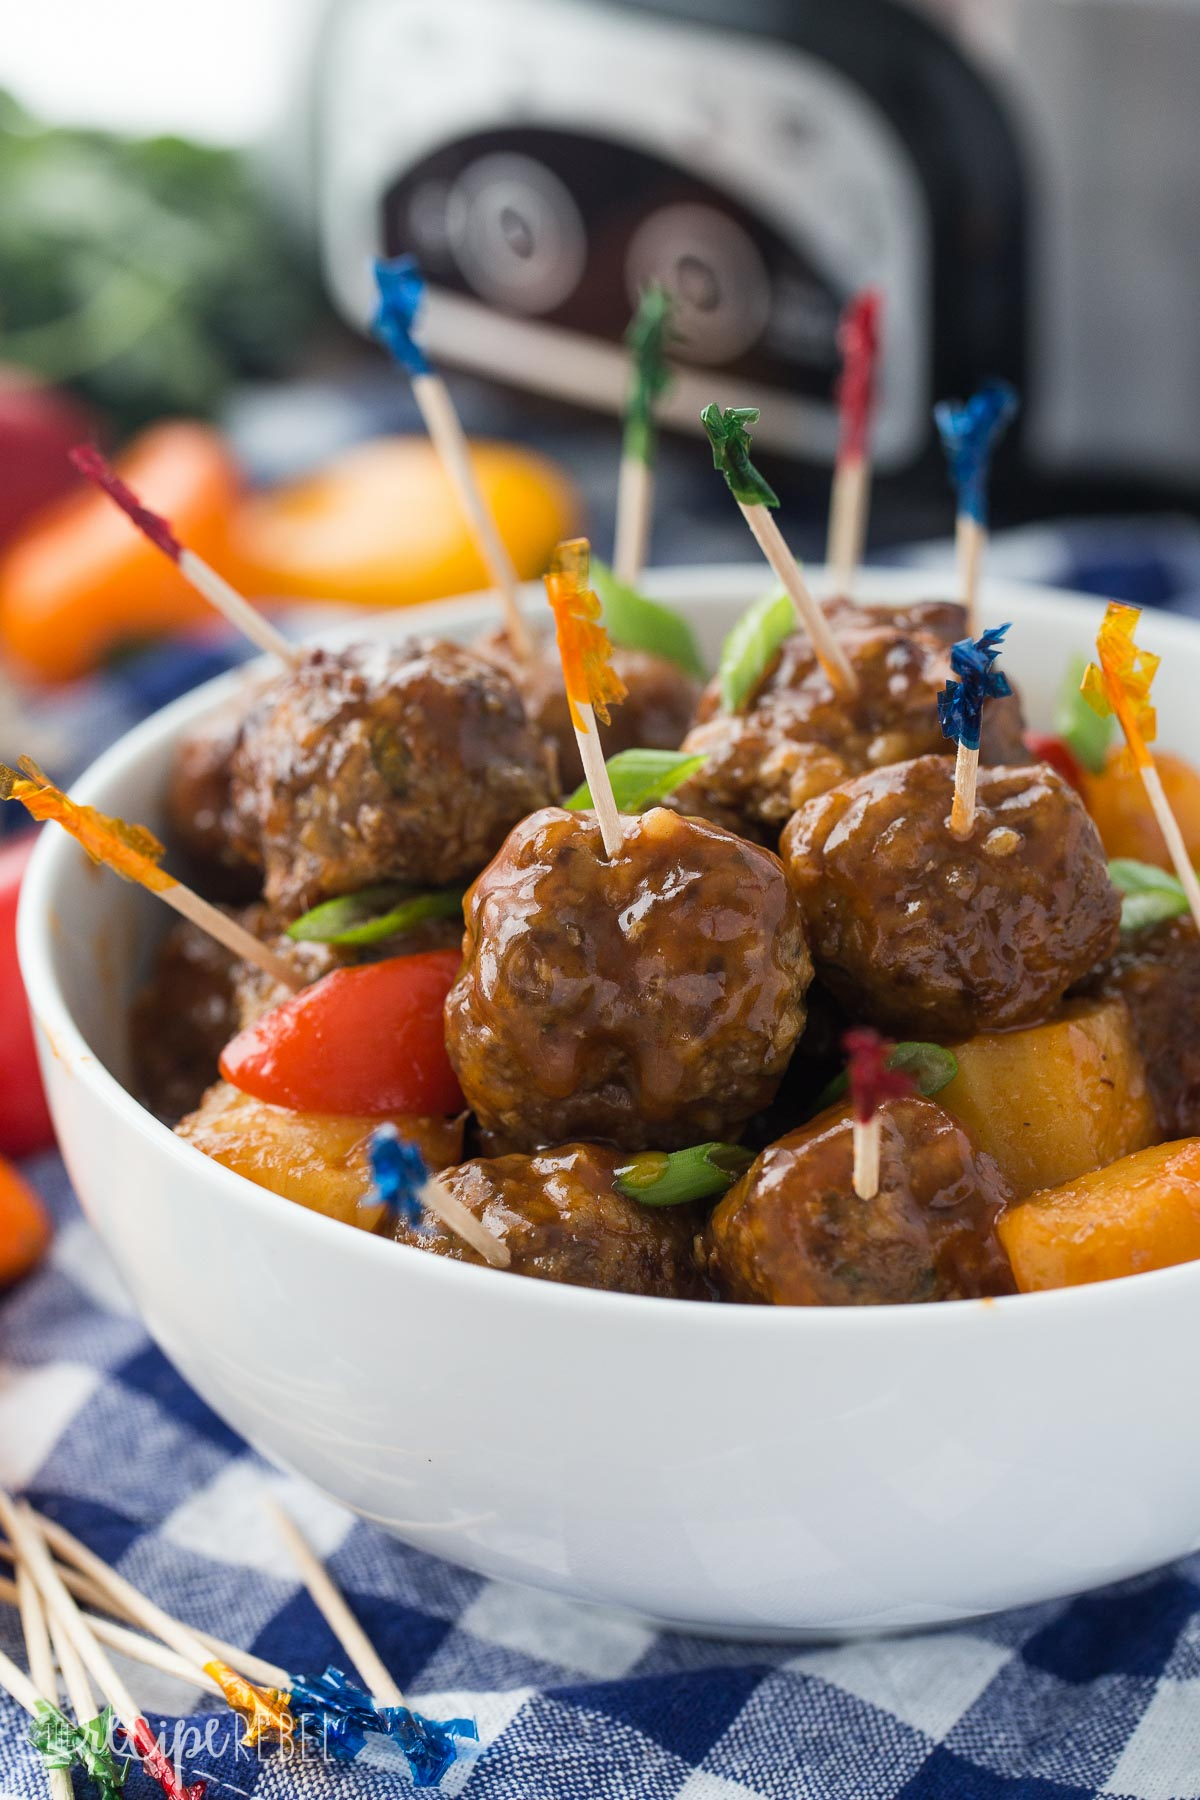 Slow-Cooker-Pineapple-Brown-Sugar-Meatballs-www.thereciperebel.com-3-of-6-2